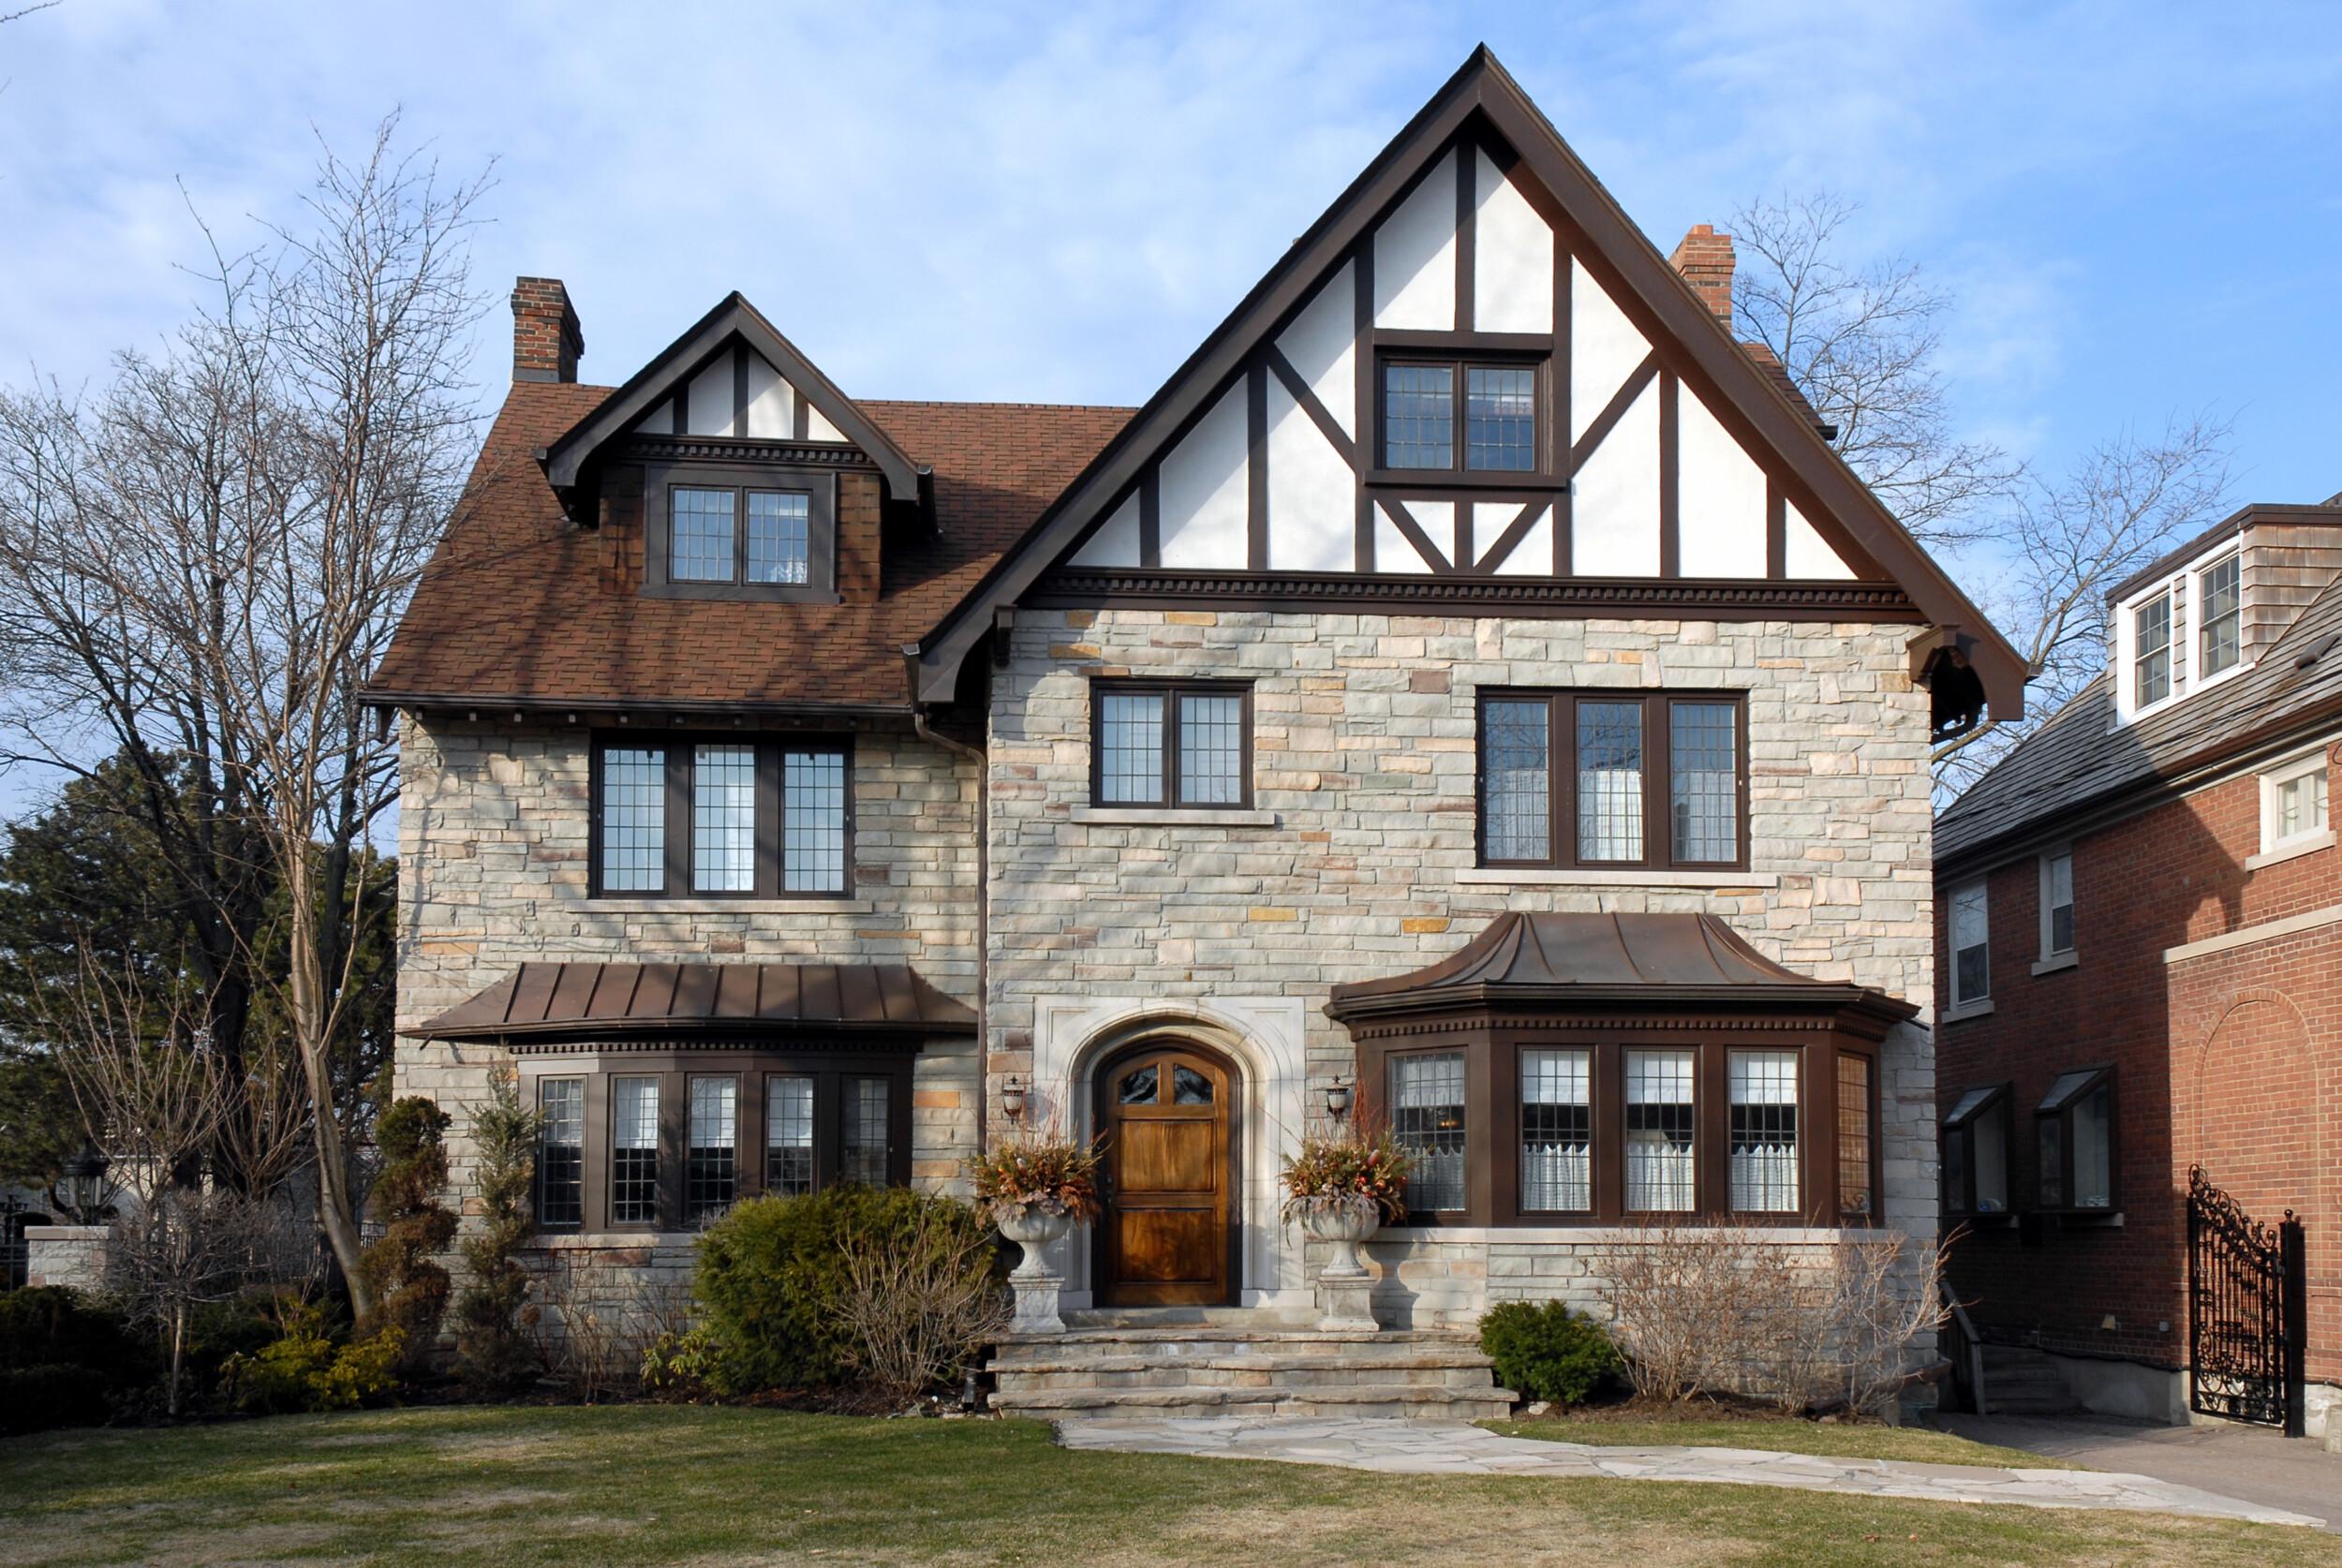 traditional tudor style house